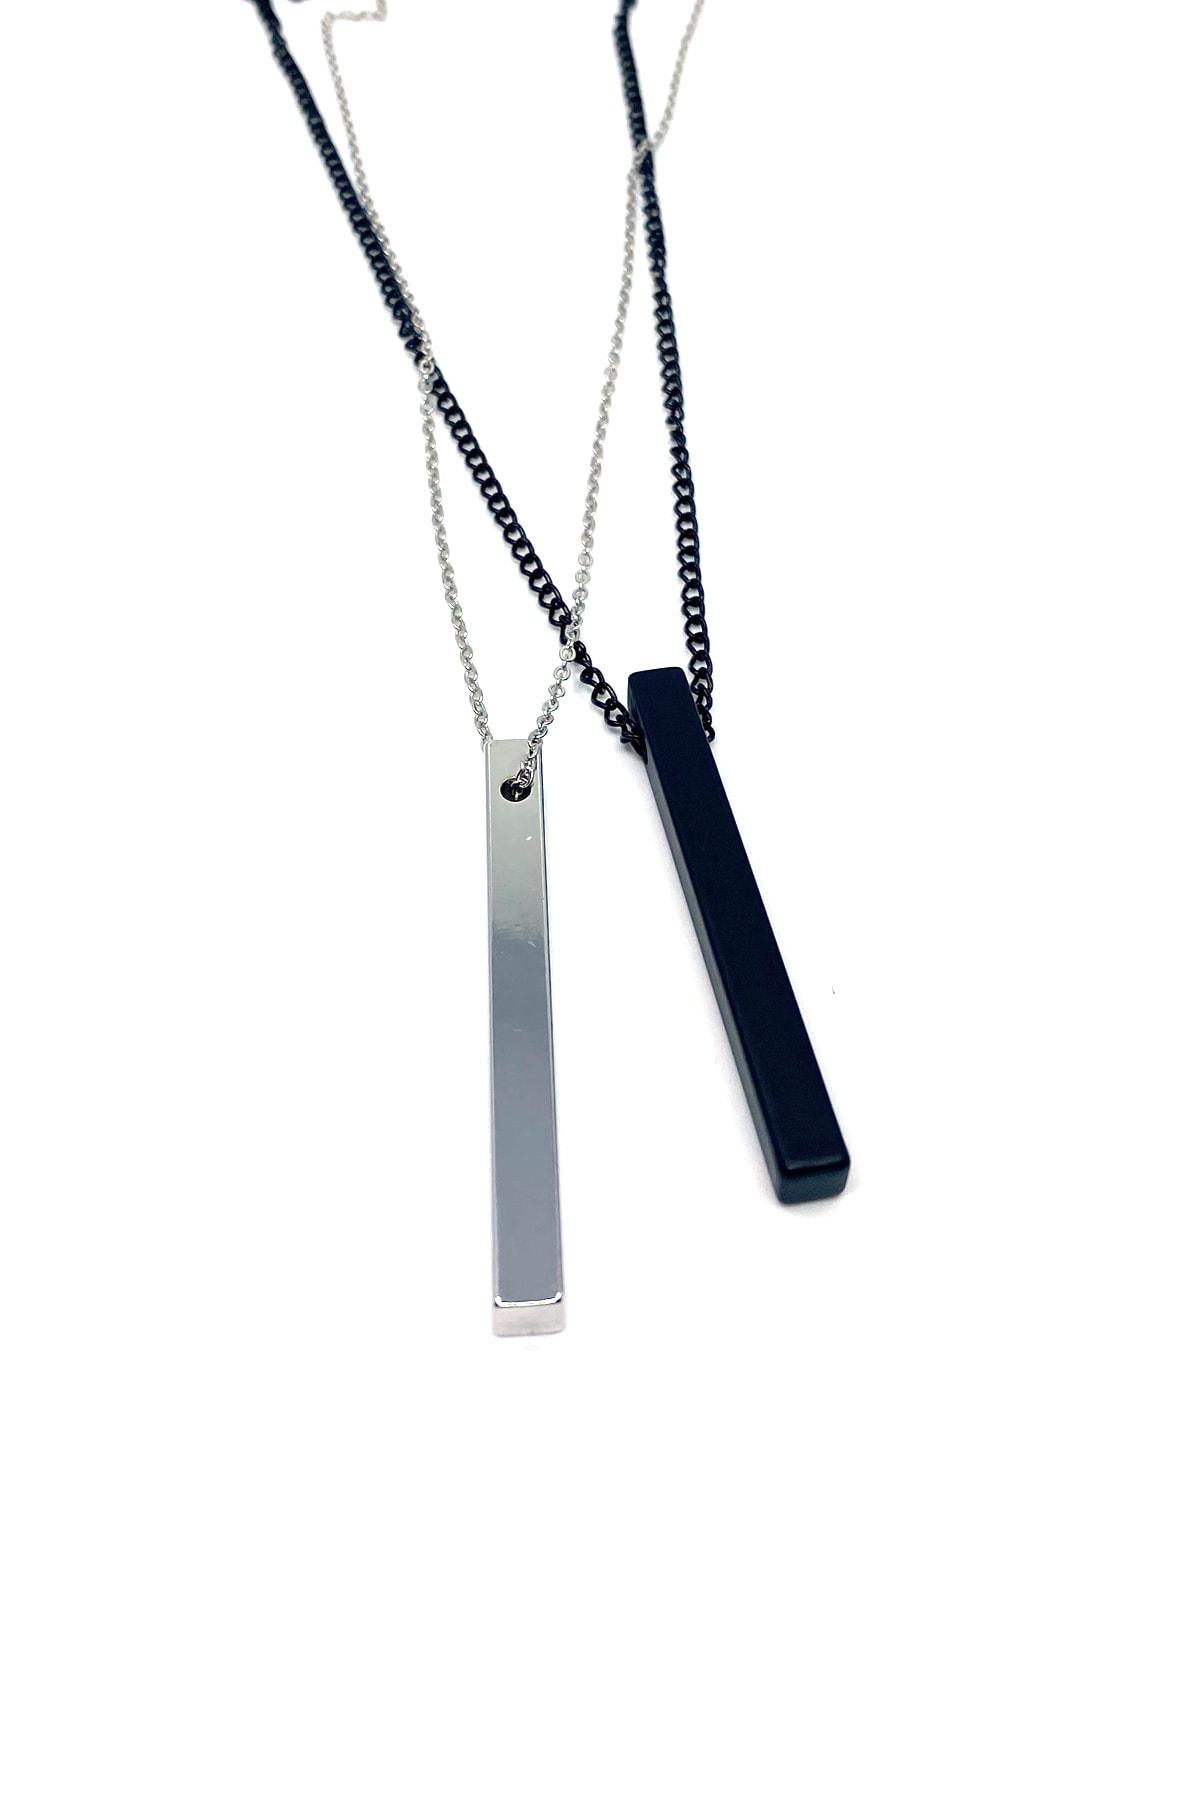 Çubuk Kolye 60 Cm Gümüş Ve Siyah Renk Set